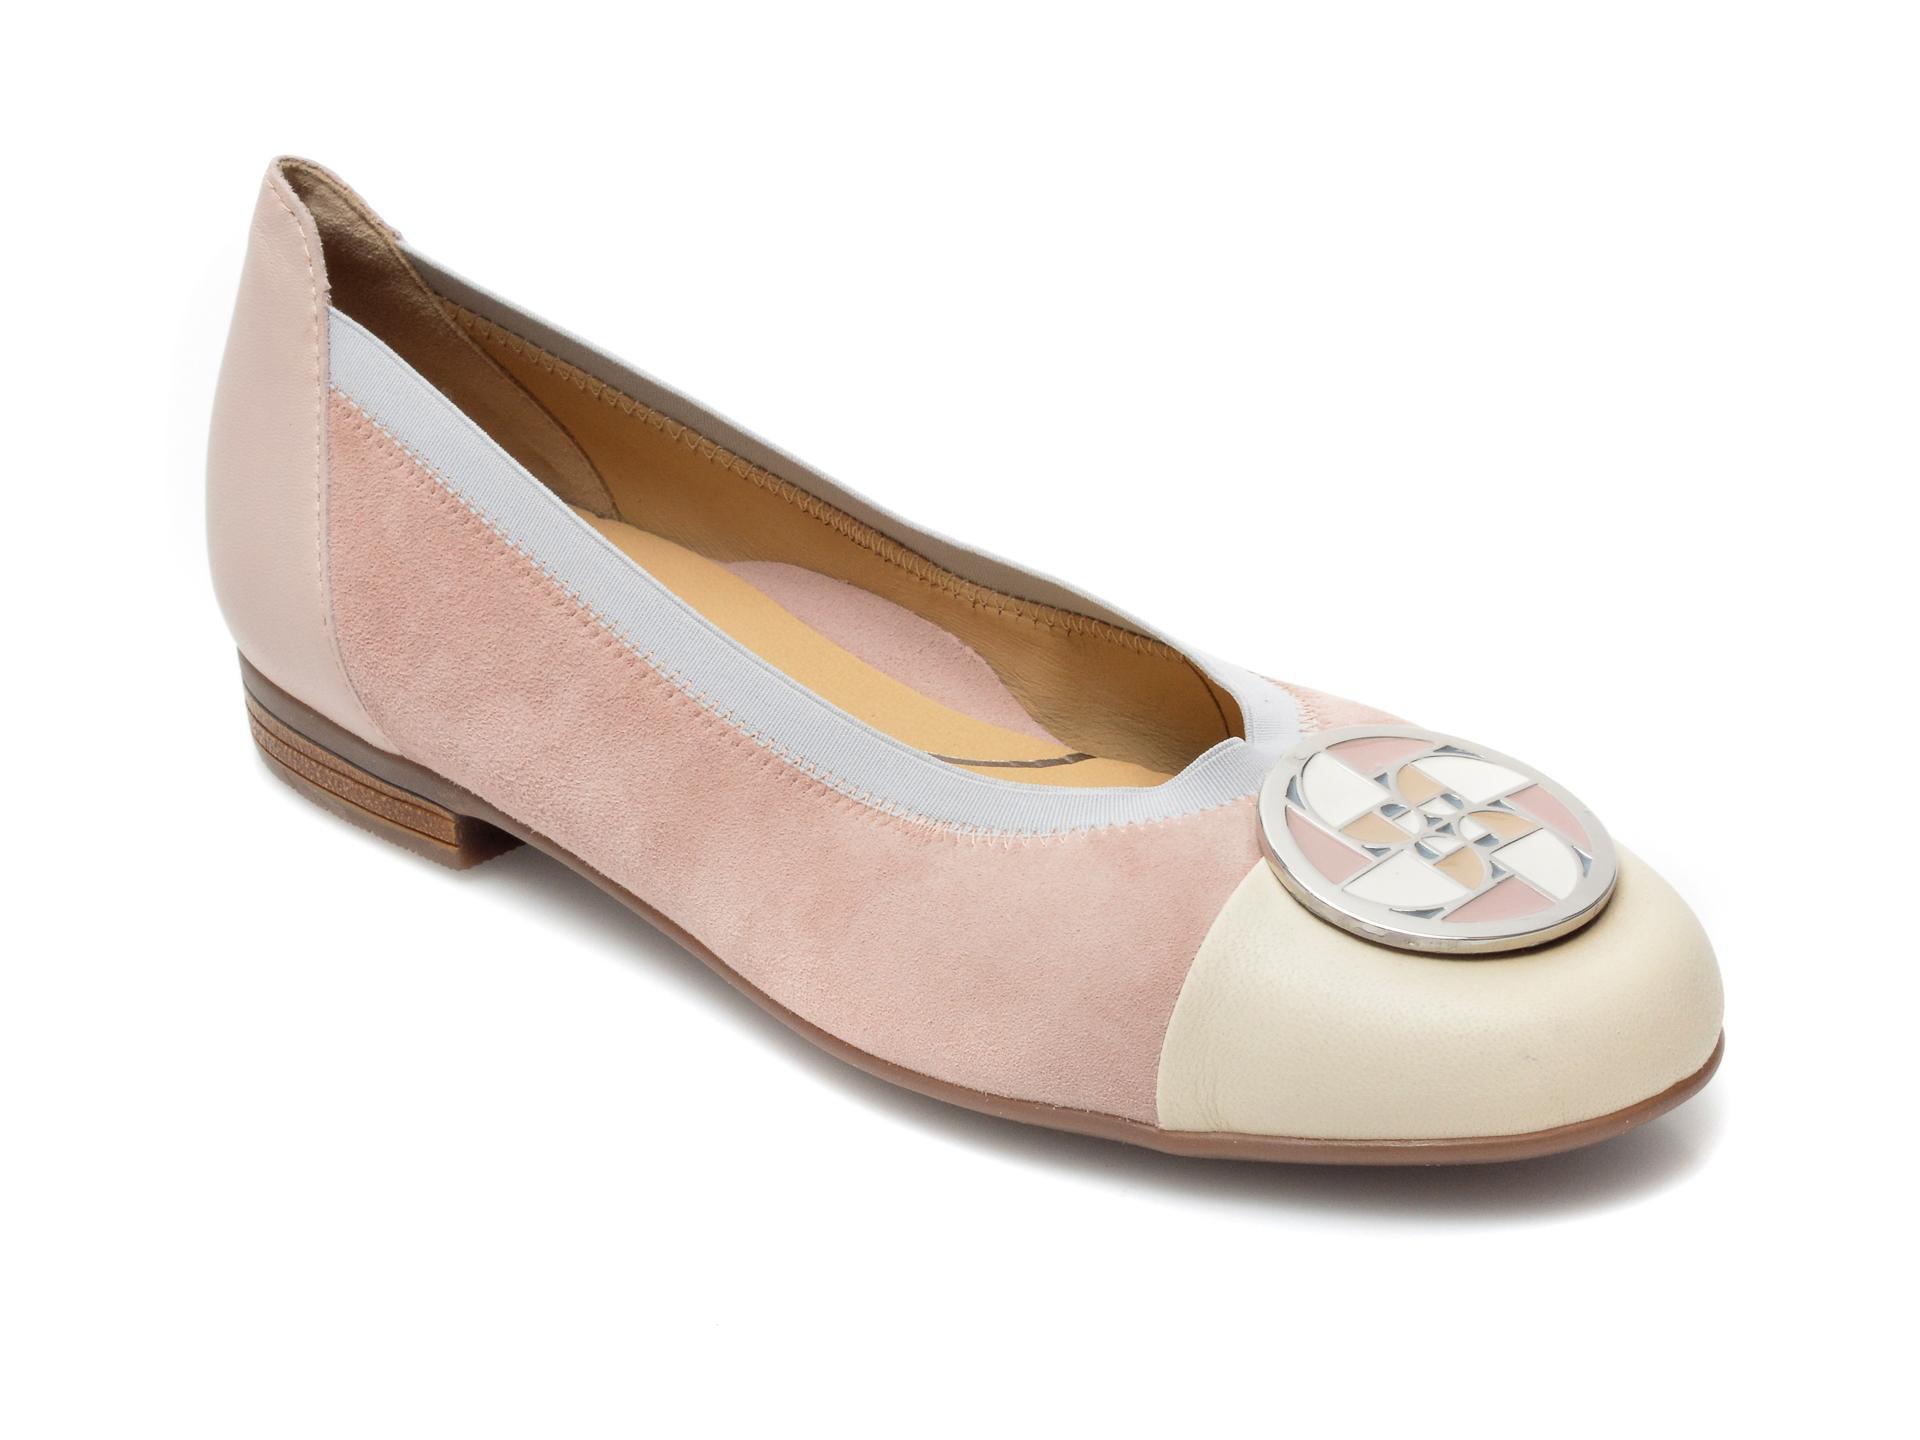 Balerini dama ARA, 31321, din piele intoarsa roz